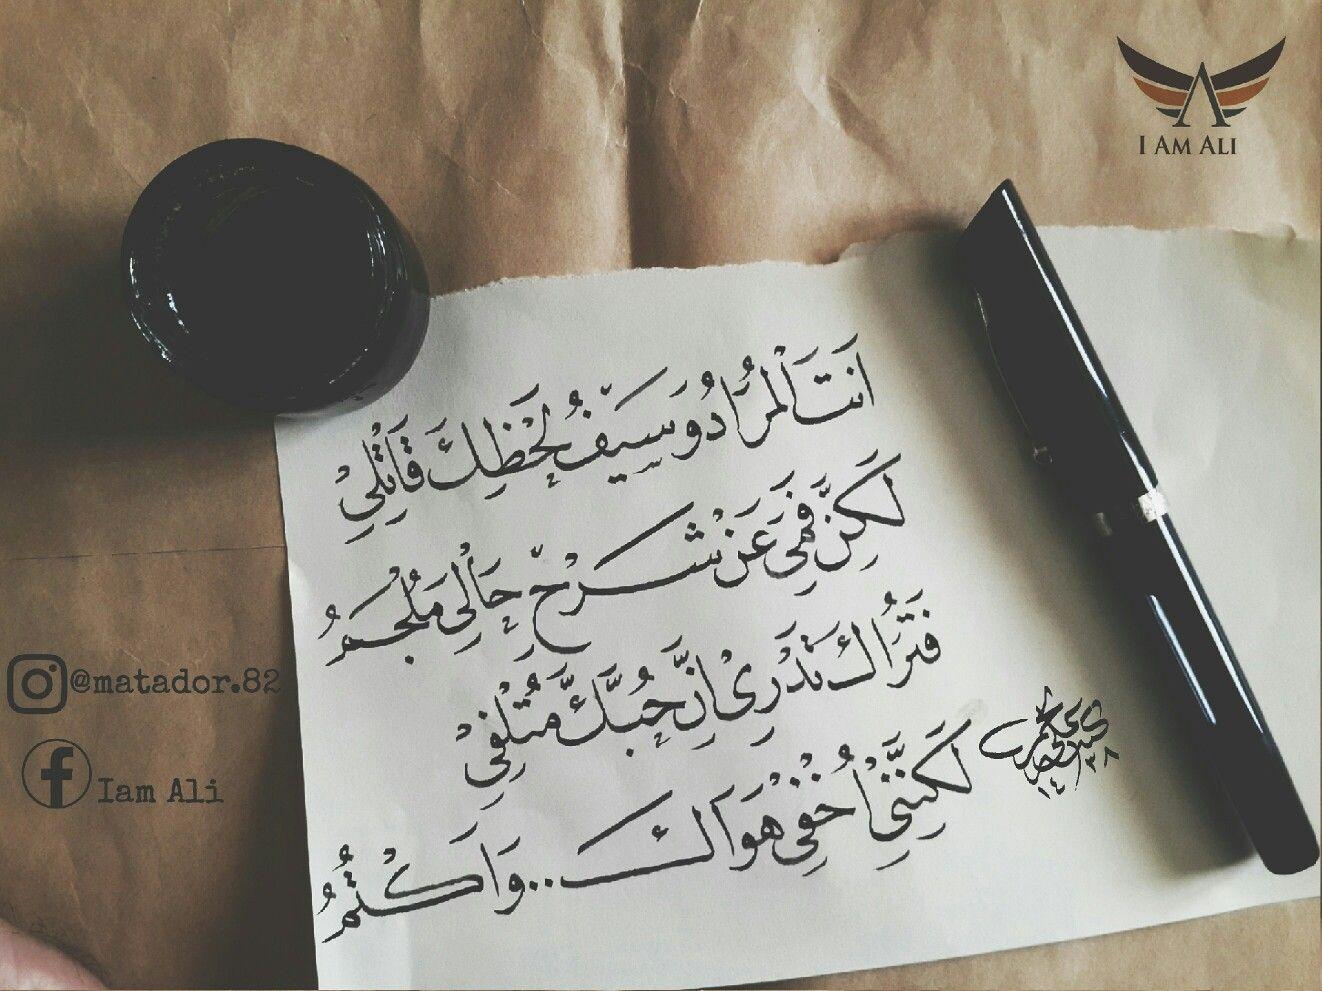 انت المراد و سيف لحظك قاتلي خطي نسخ اقتباسات العراق Quotes Arabic Words Tu Me Manques